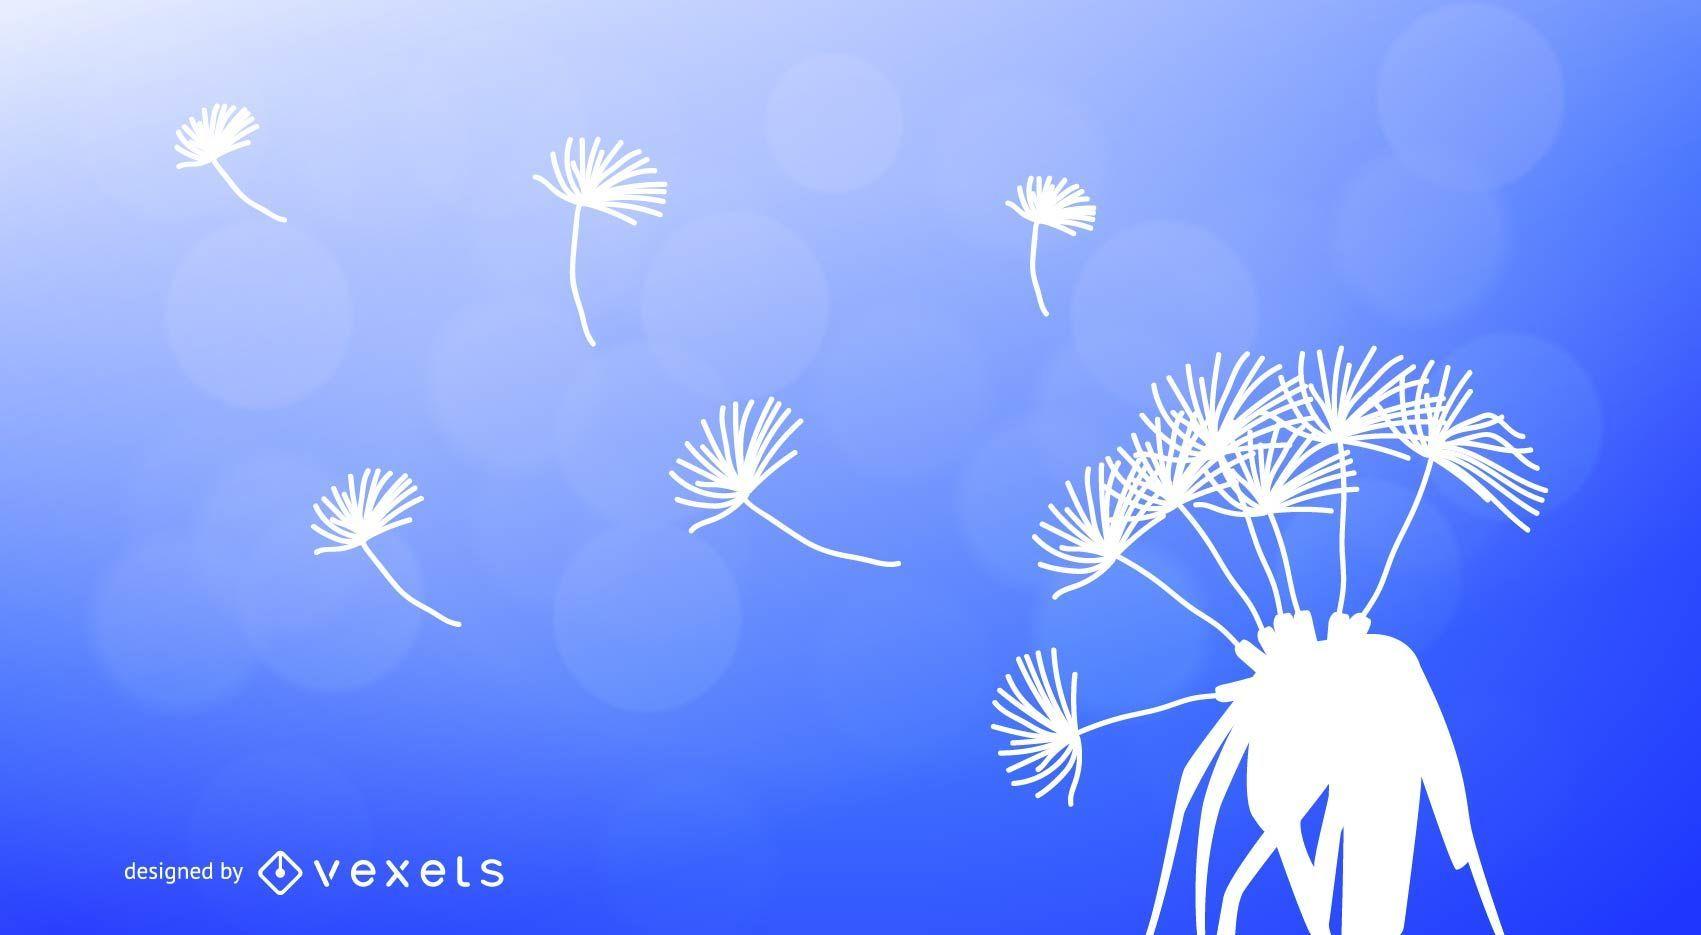 Dandelion silhouettes vector material